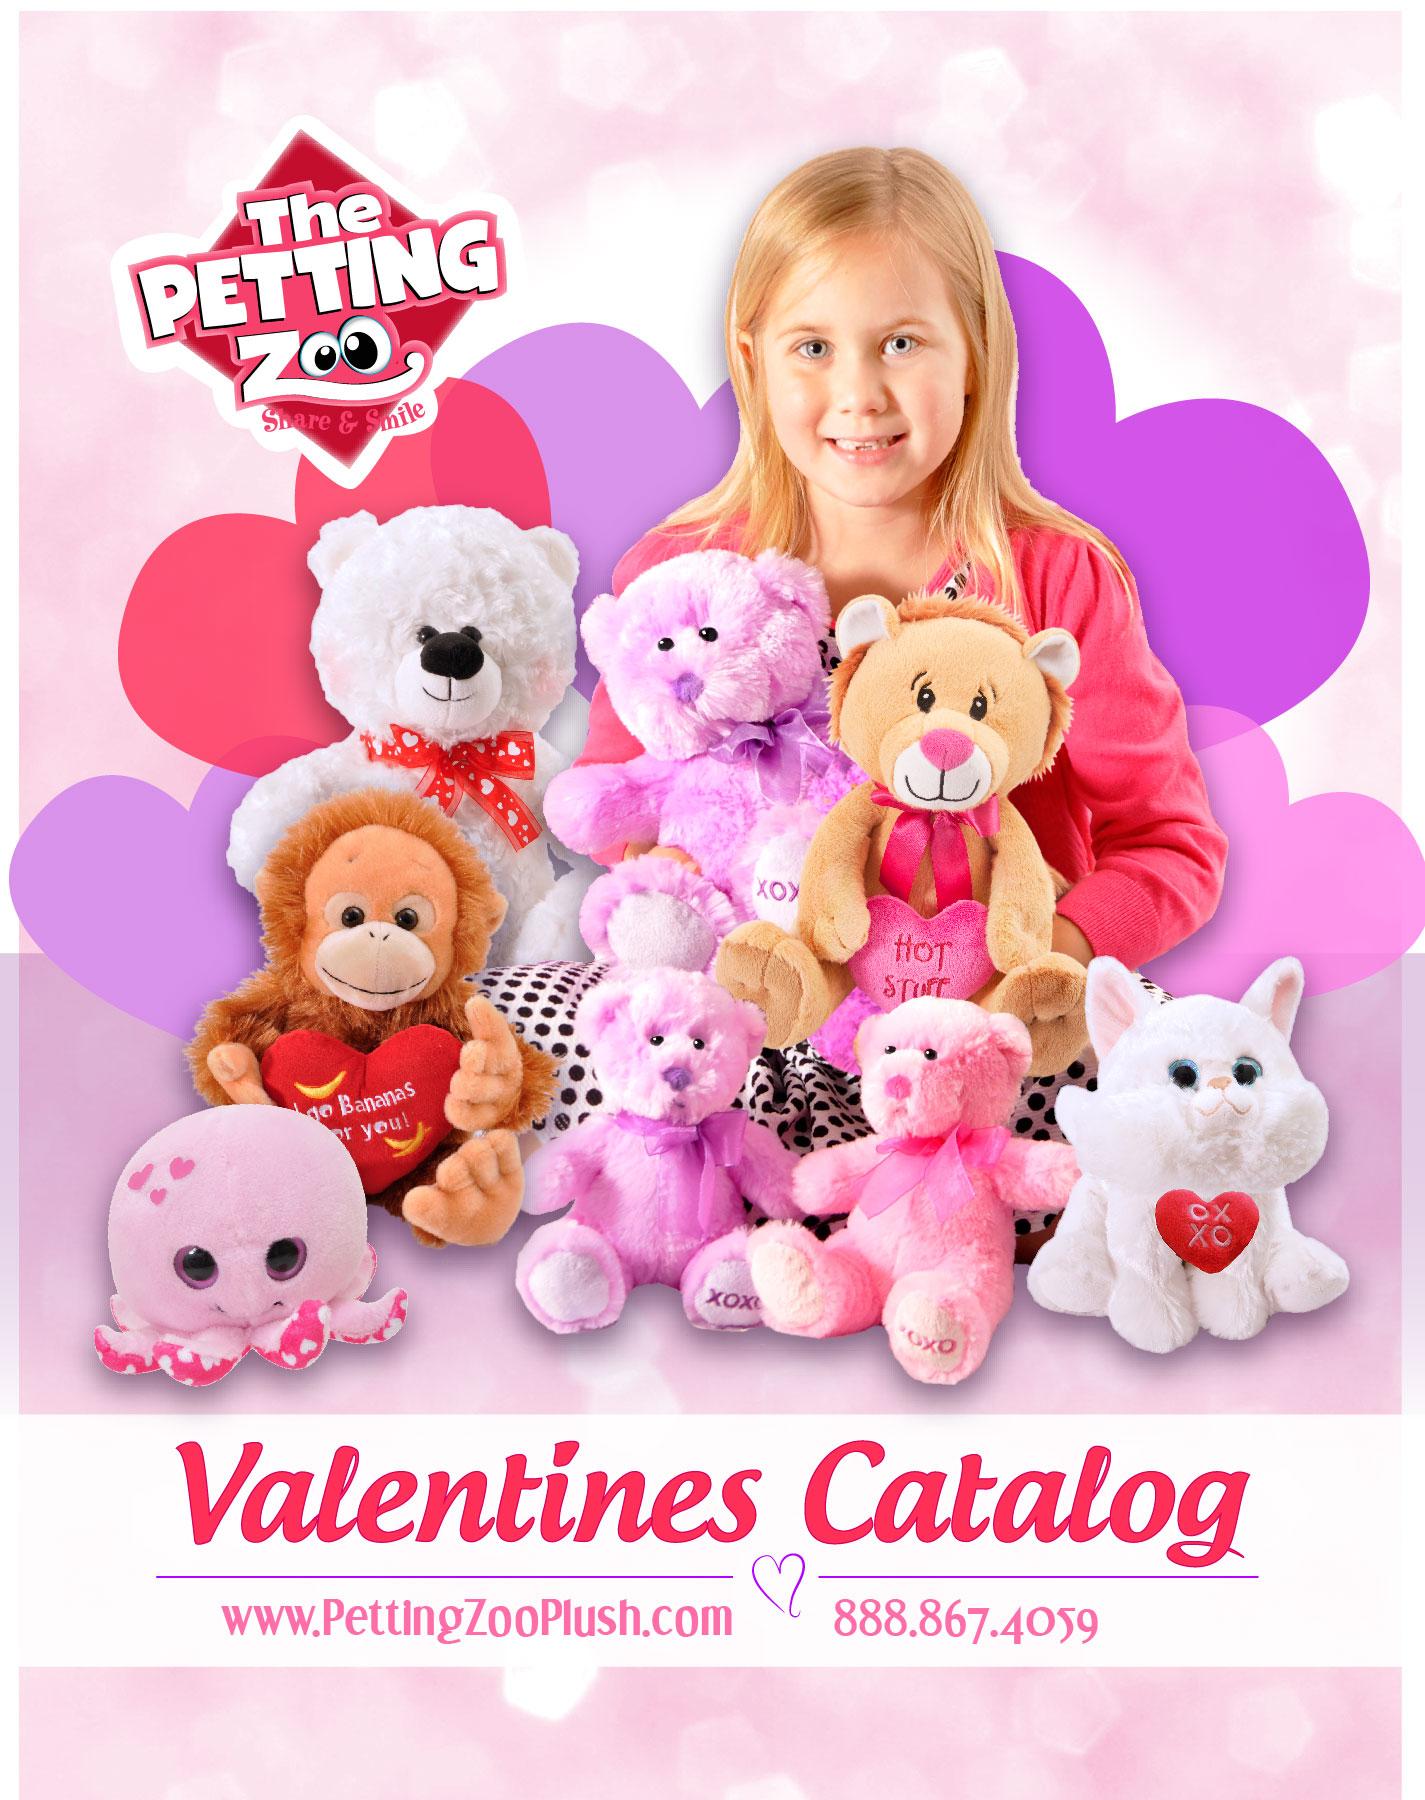 Valentines Catalog